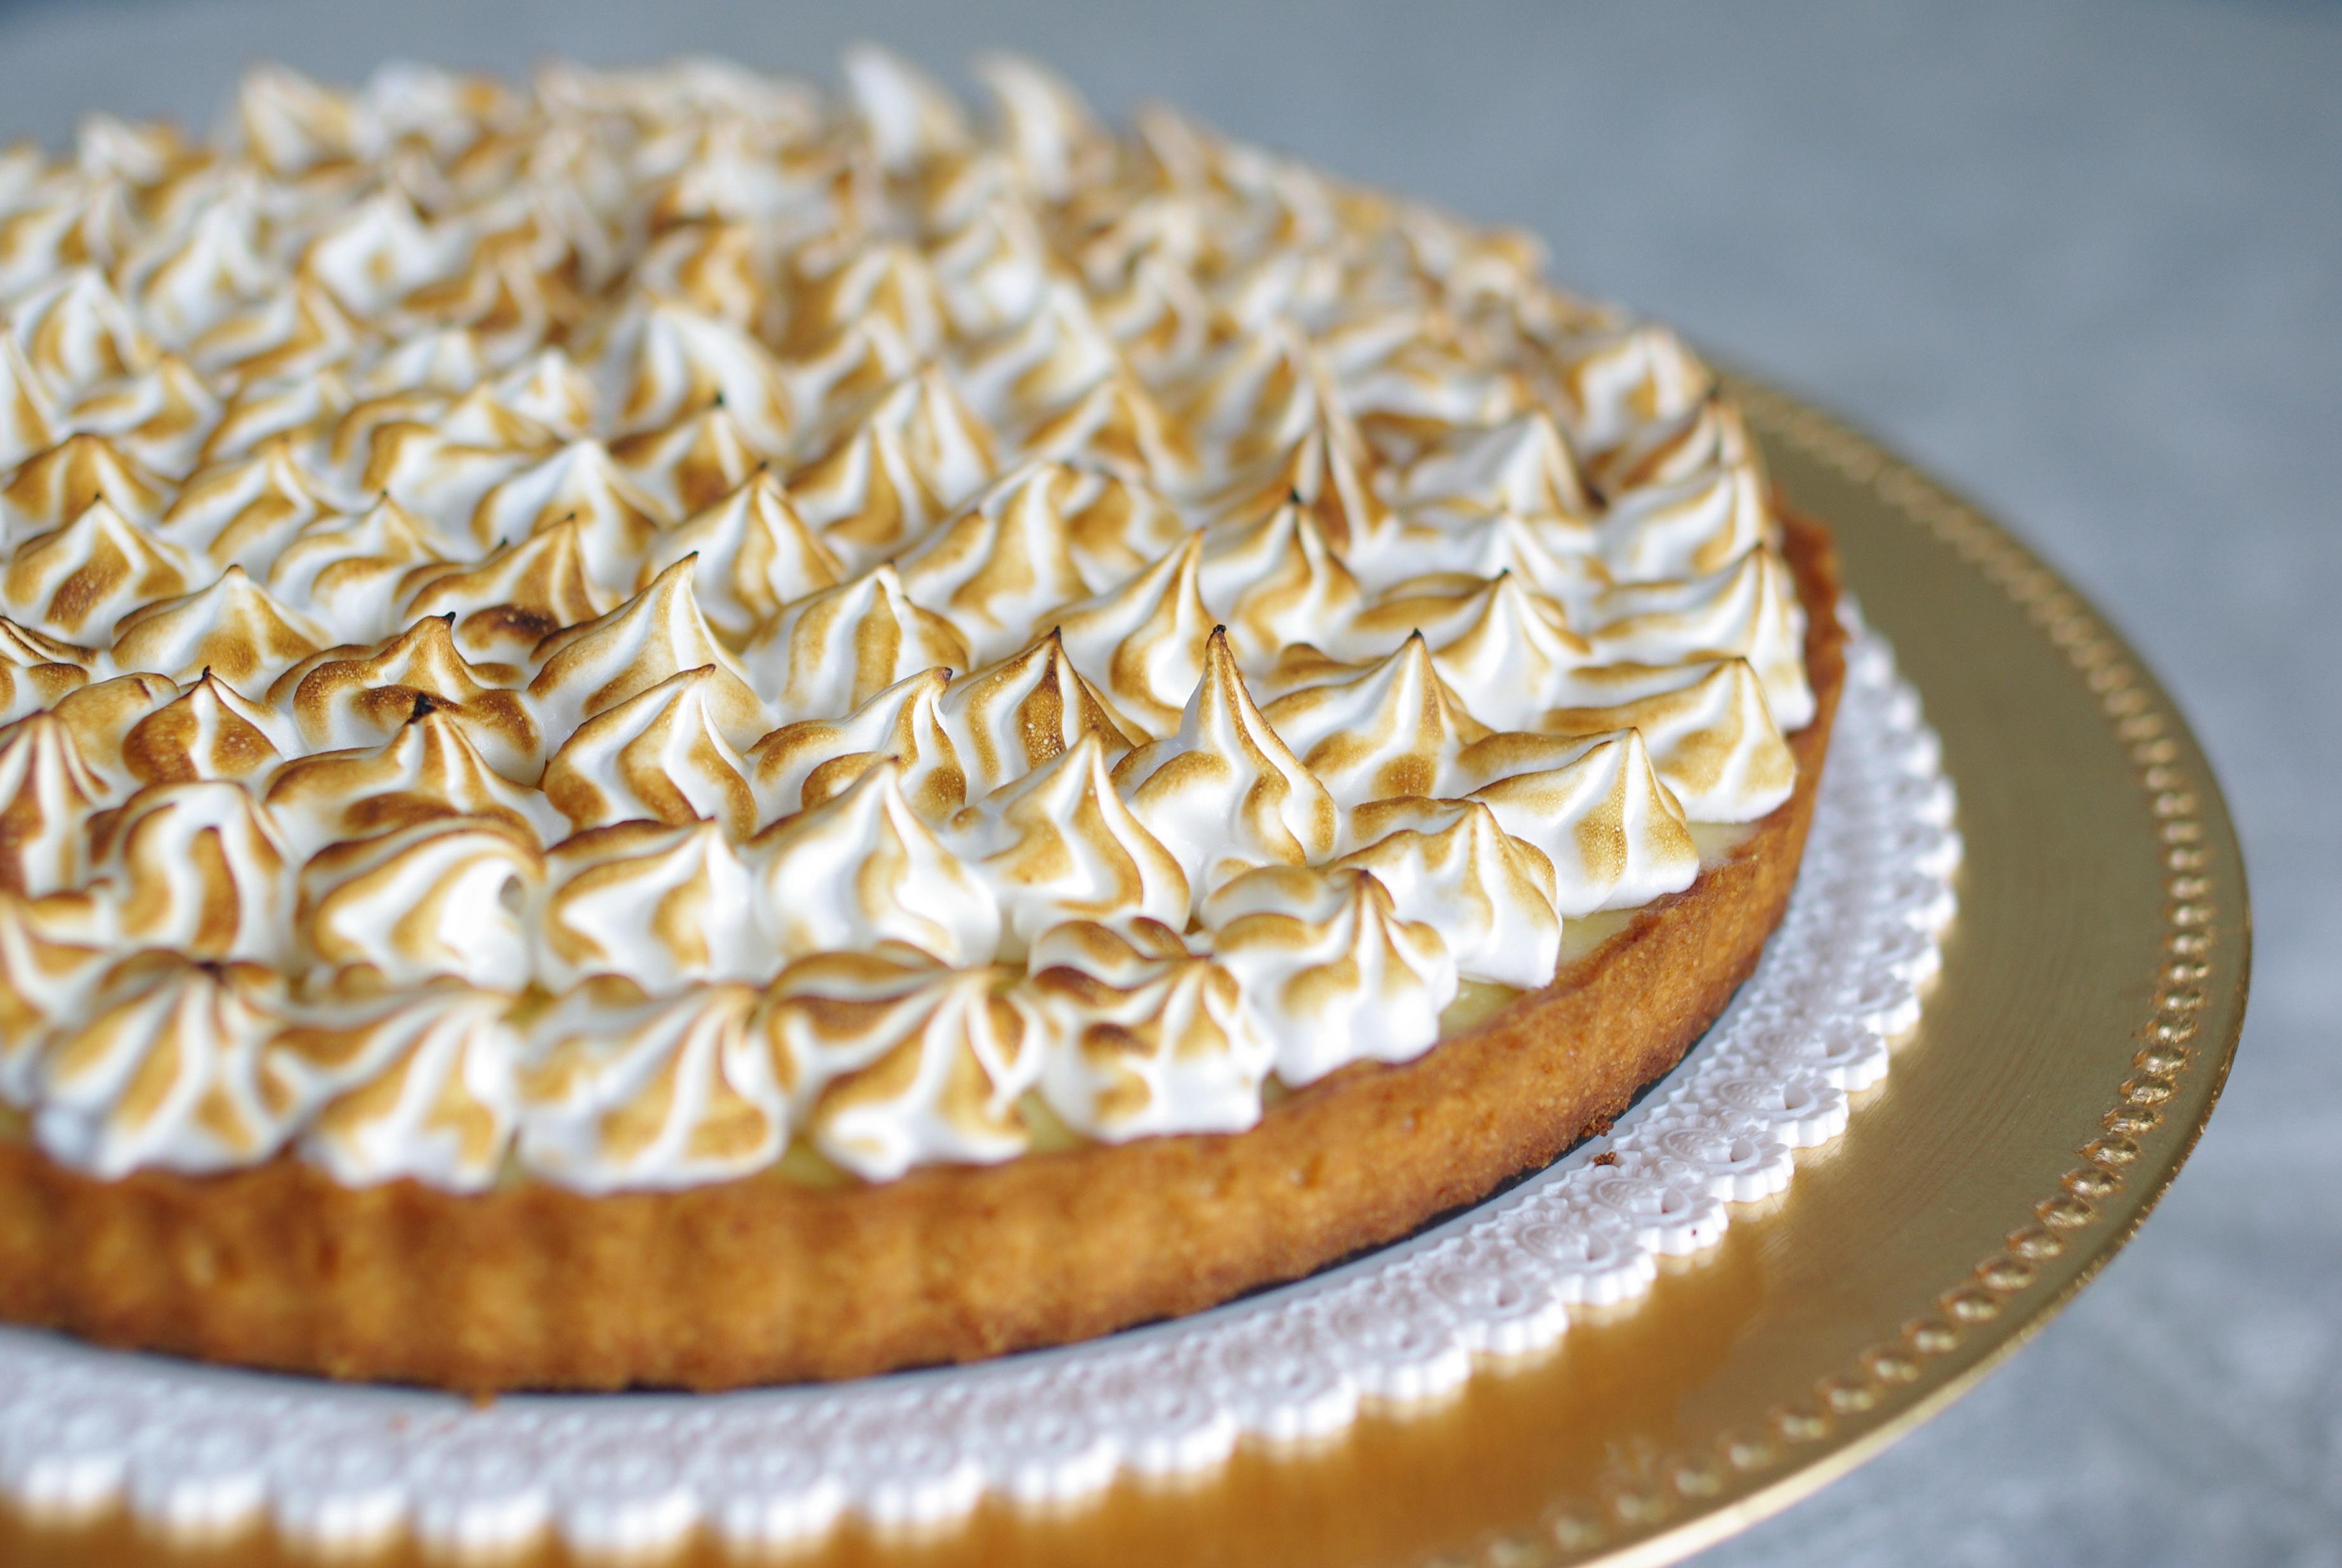 Camille kitchen la tarte au citron meringu e de marabout chef - Tarte au citron meringuee facile ...